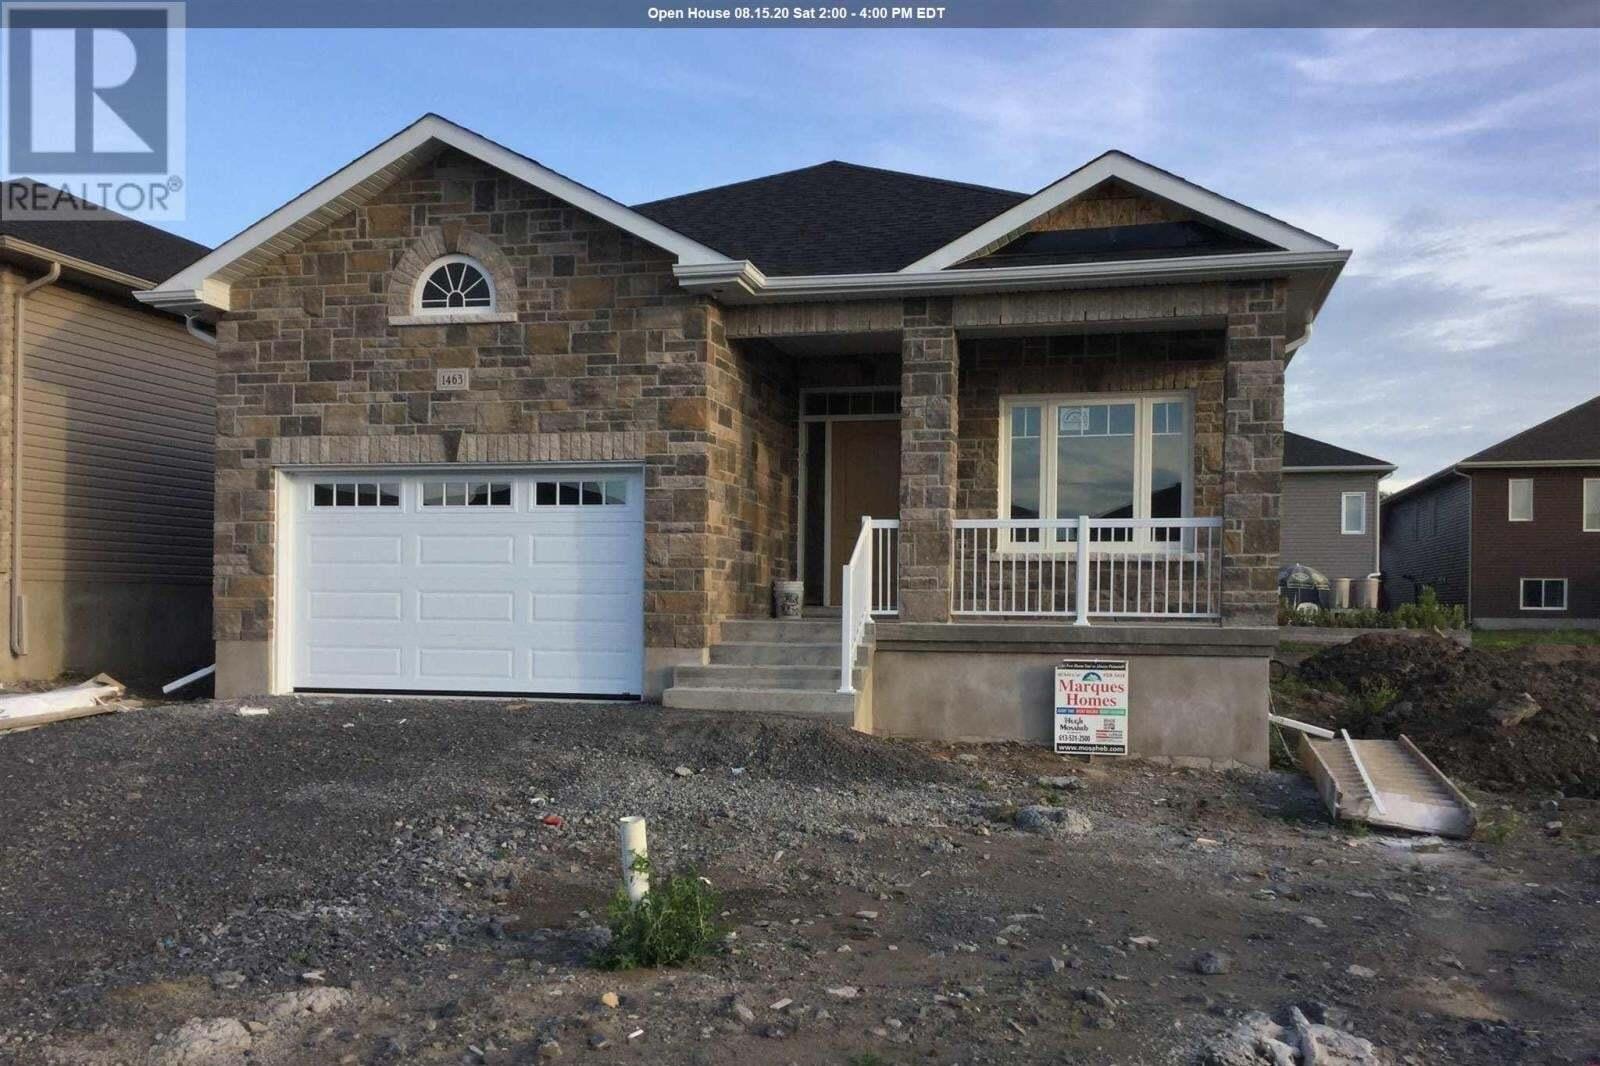 House for sale at 1463 Evergreen Dr Kingston Ontario - MLS: K20002047